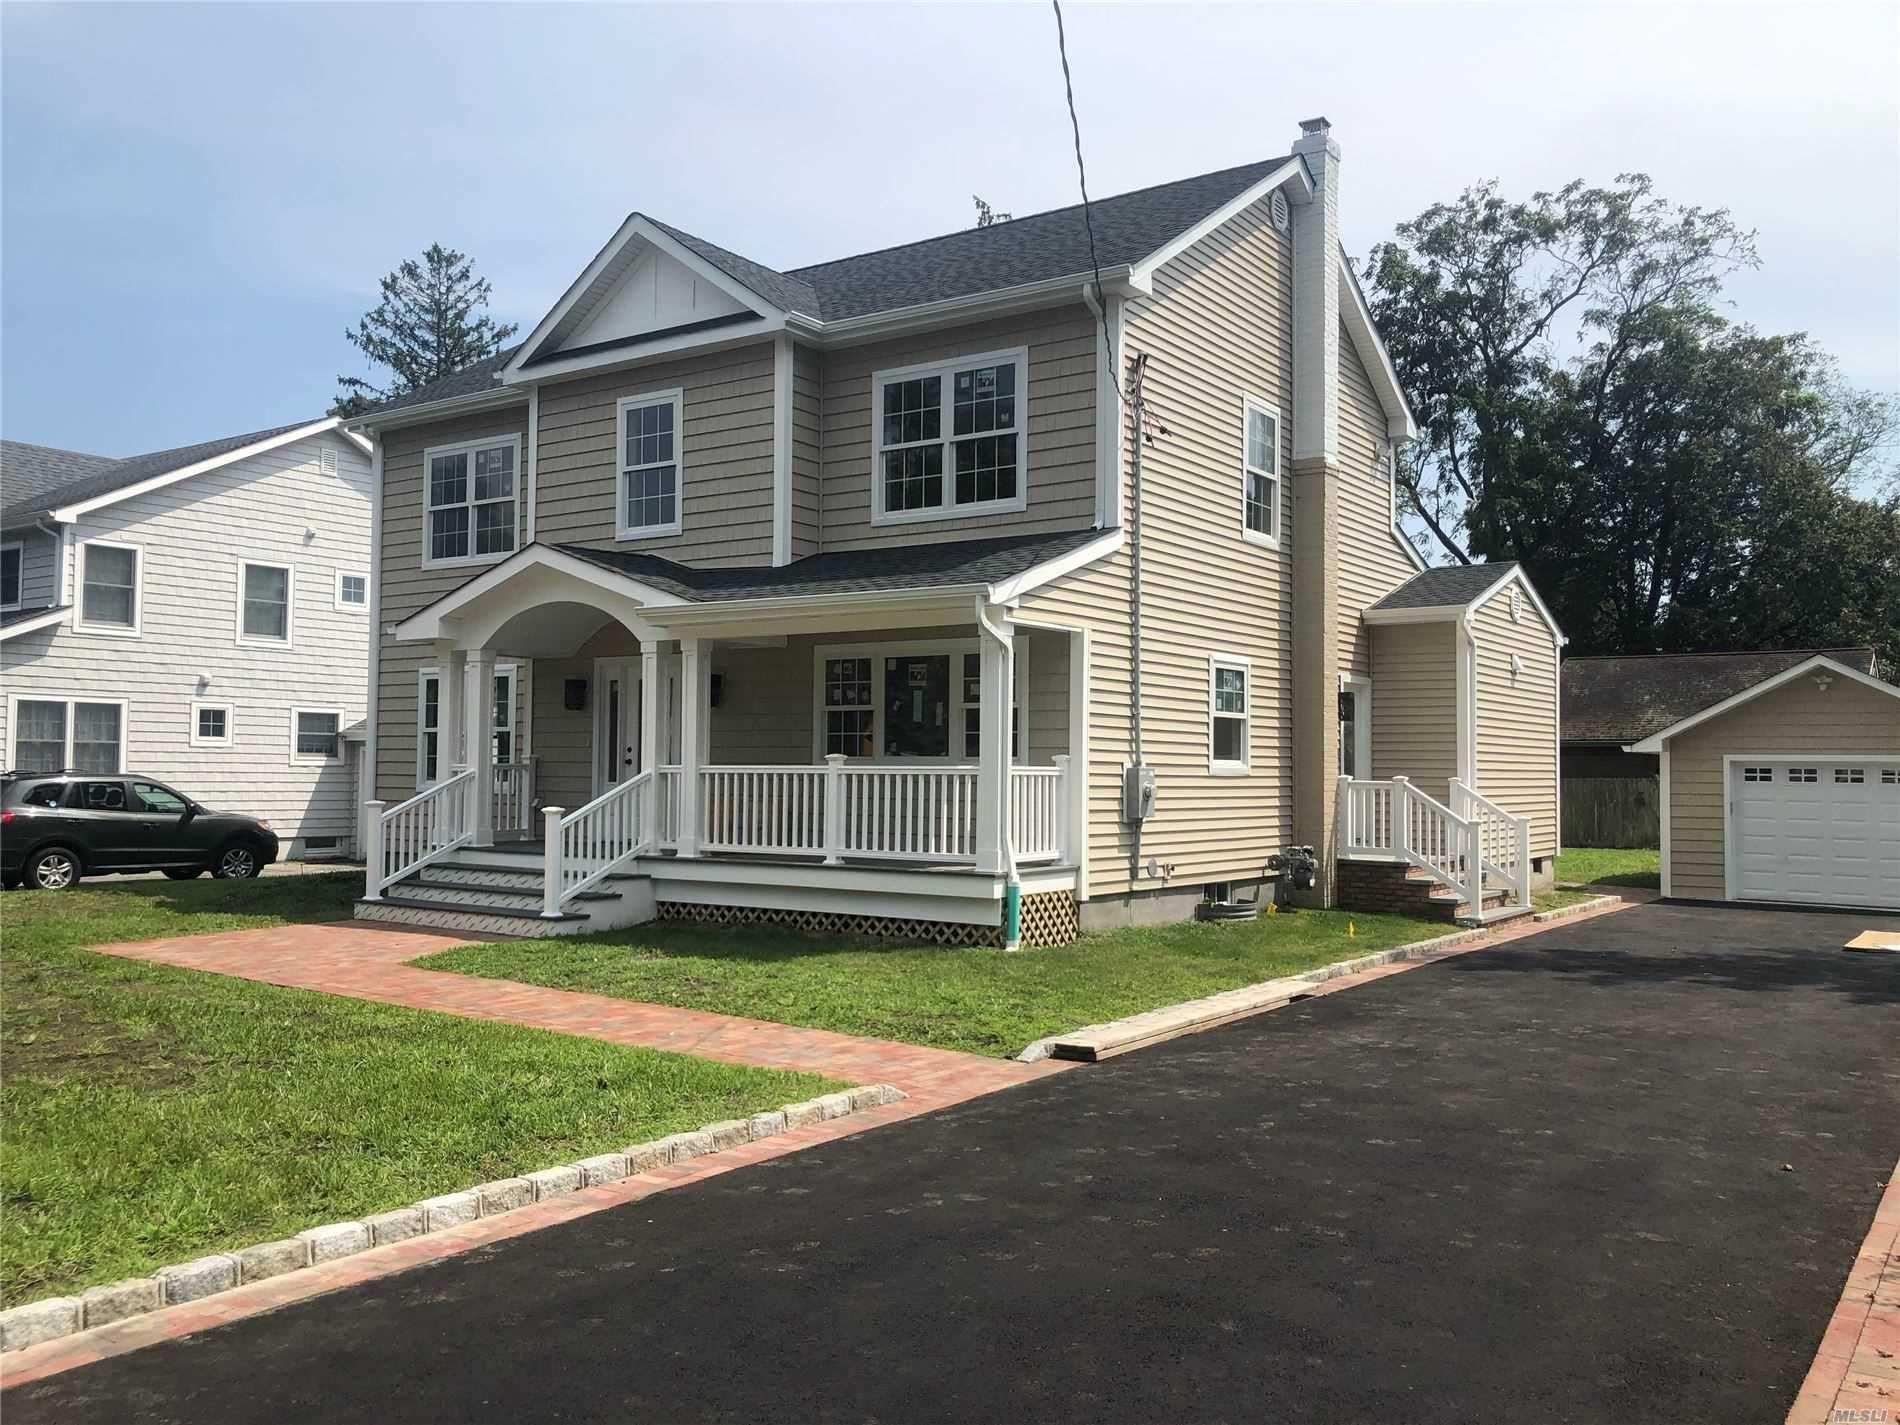 56 Edgewood Road, West Islip, NY 11795 - MLS#: 3243550